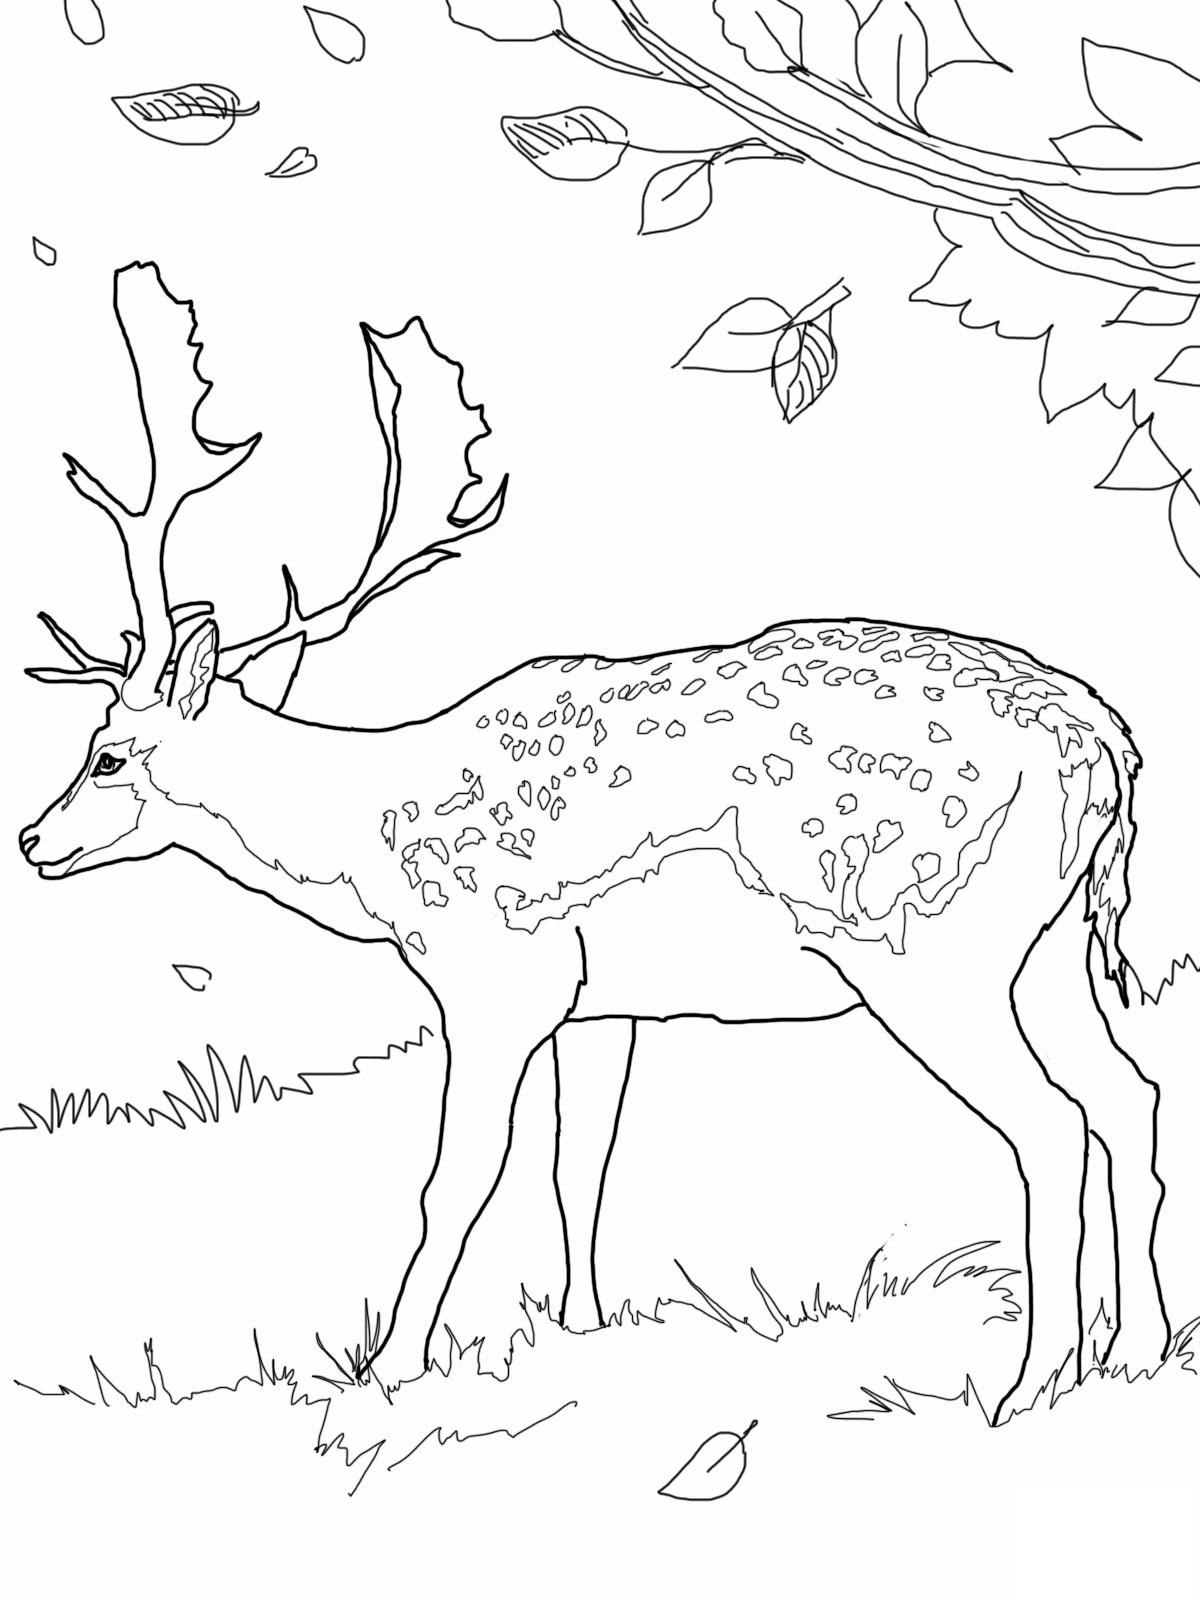 1200x1600 Free Printable Deer Coloring Pages For Kids Ciervo, Ocio Y Animales